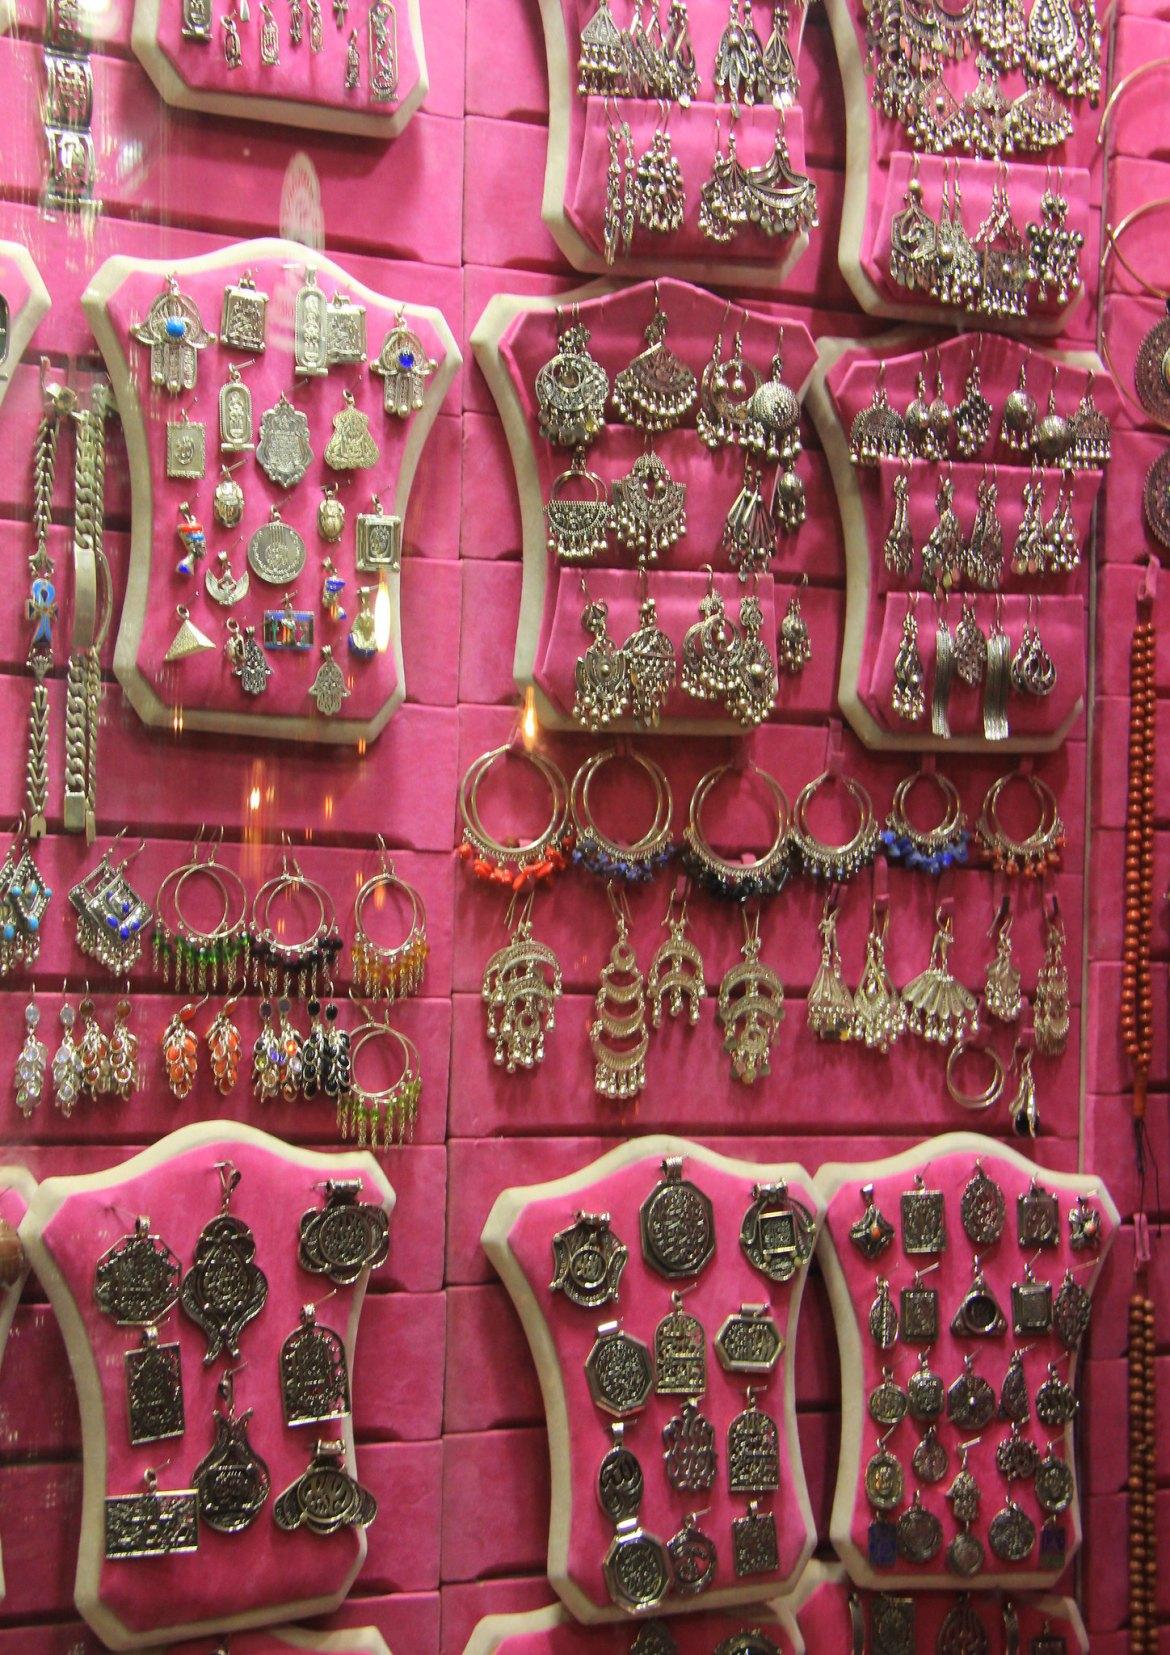 You can buy jewellery at khan el khalili